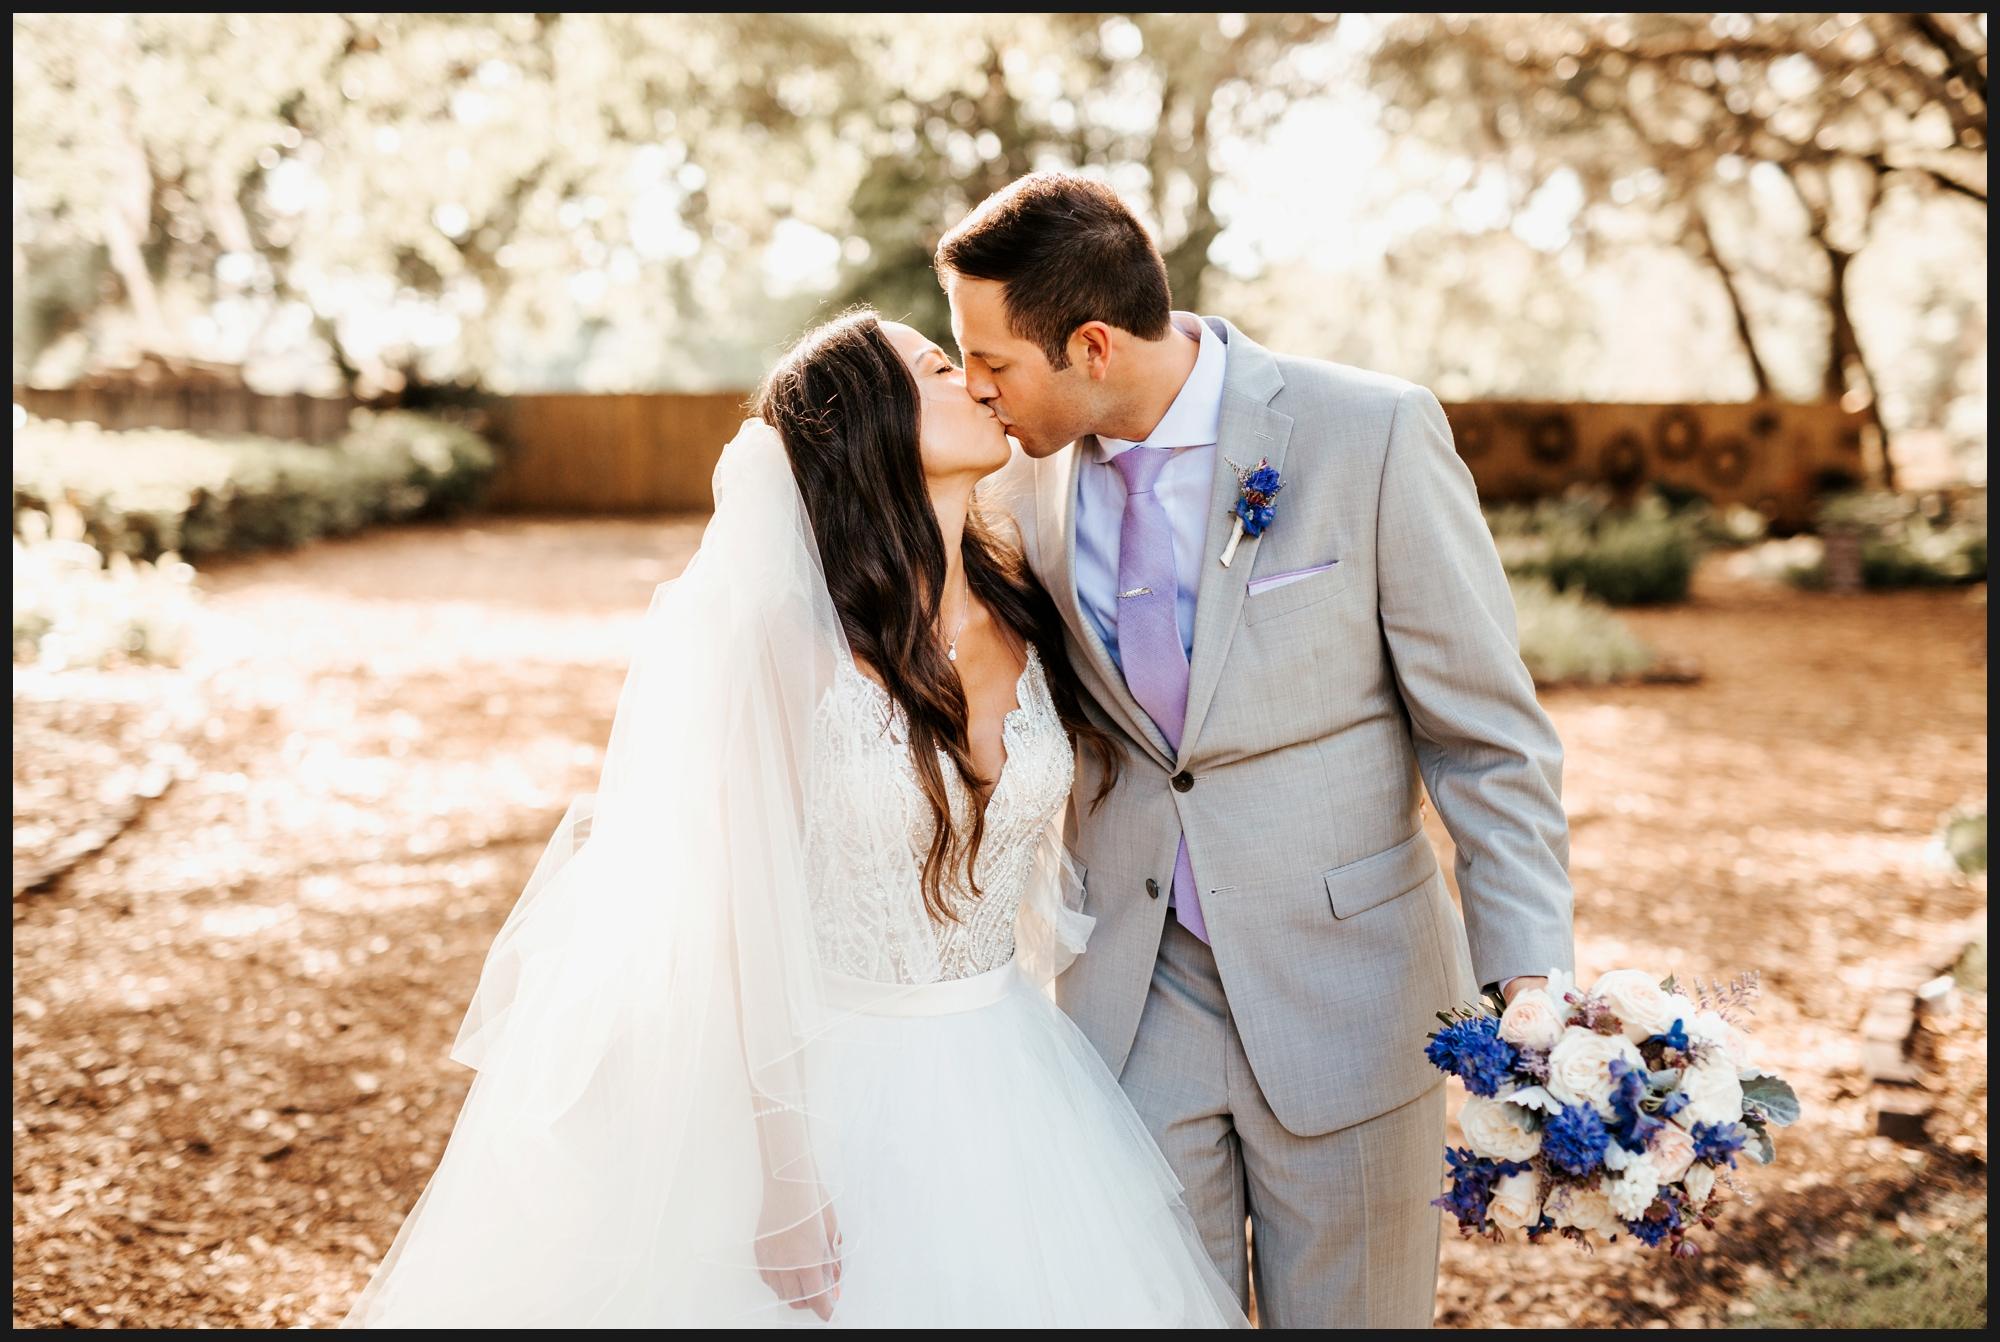 Orlando-Wedding-Photographer-destination-wedding-photographer-florida-wedding-photographer-bohemian-wedding-photographer_1626.jpg